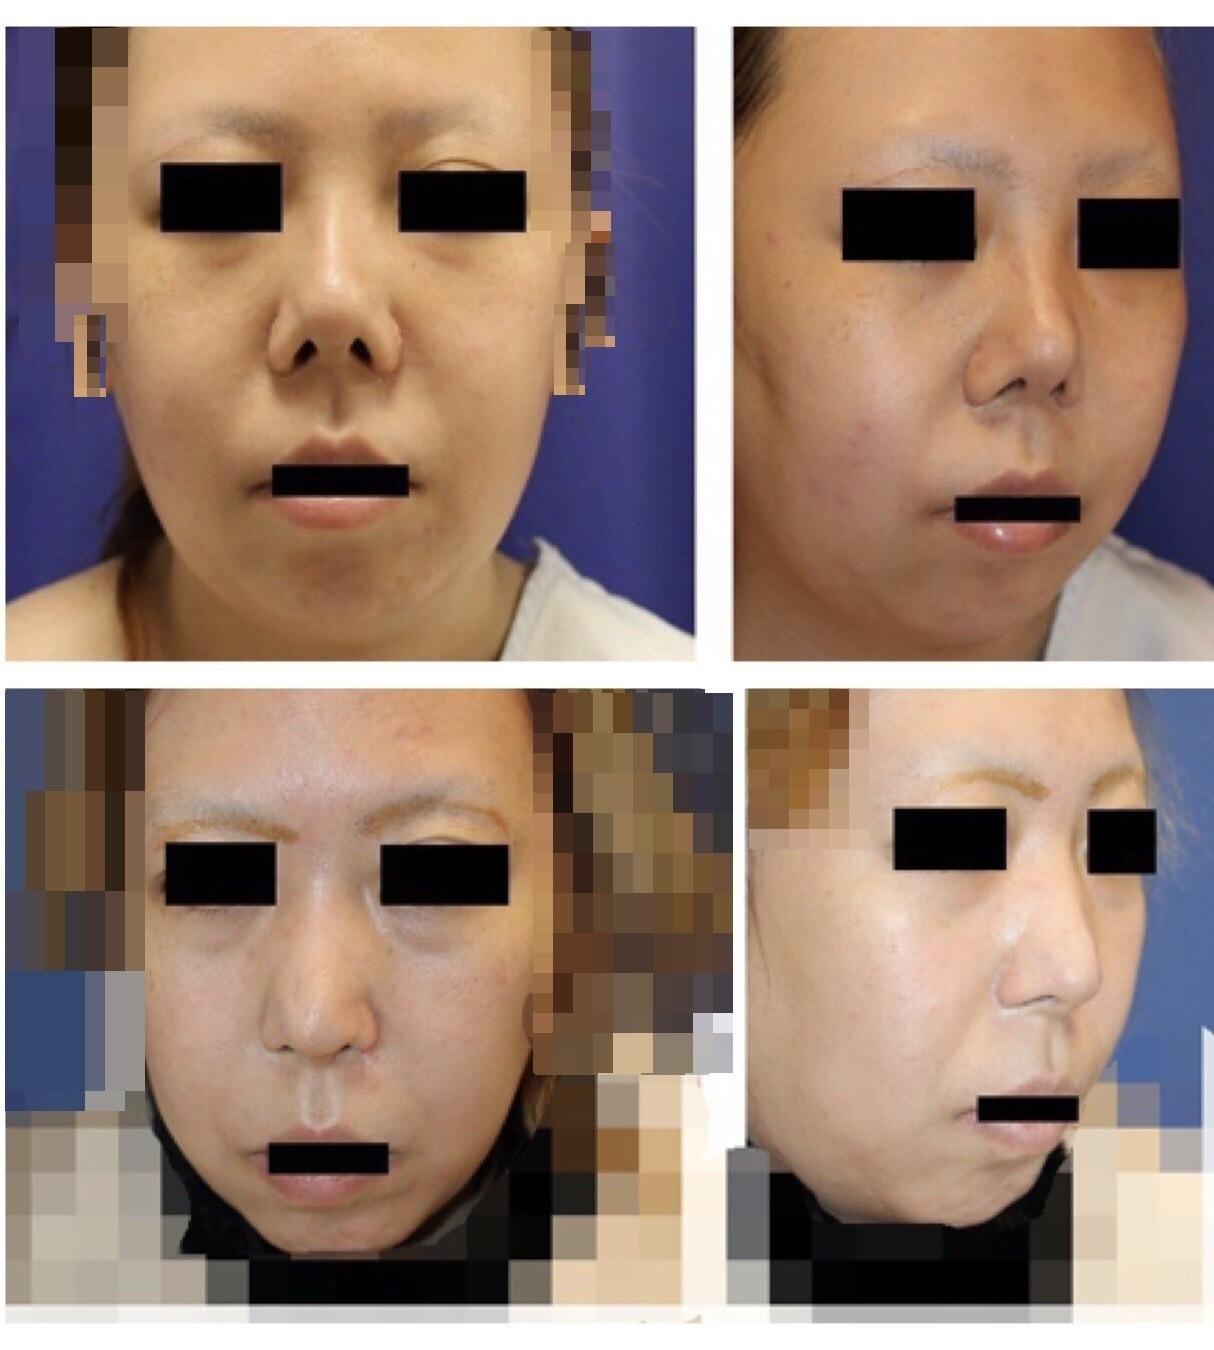 他院鼻尖縮小後、鼻プロテーゼ術後 術後修正術(鼻中隔延長術、鼻孔縁延長、婦人科軟部組織鼻先移植術等) 術後約17か月、他院術後キズ痕修正(Aセル:細胞外マトリックス)術後約16か月年再診時_d0092965_00231893.jpg